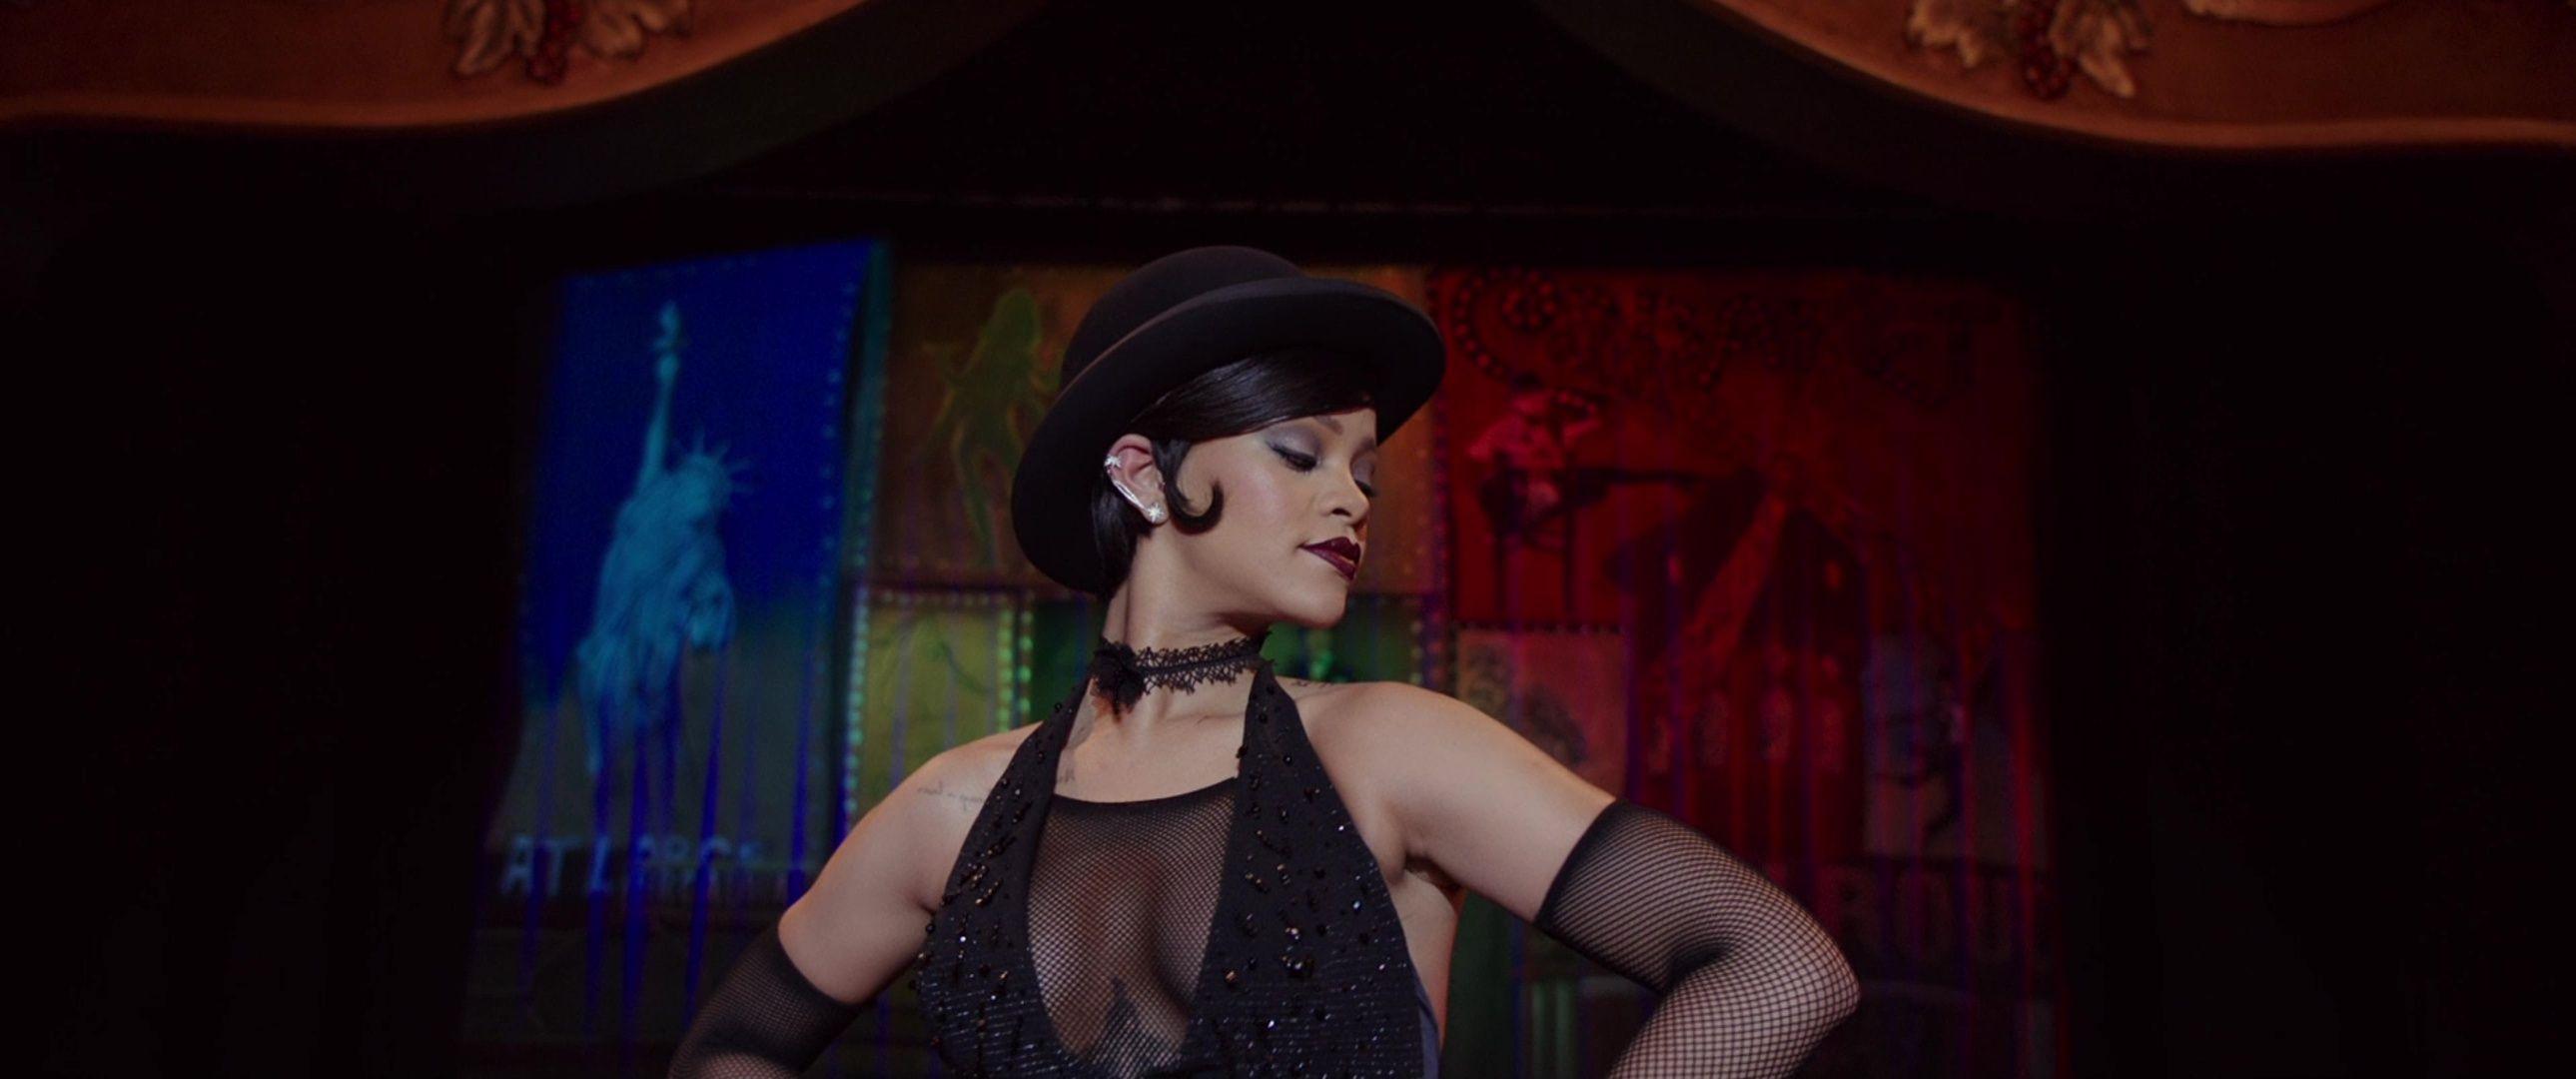 Rihanna-Sexy-72-thefappeningblog.com_.jpg